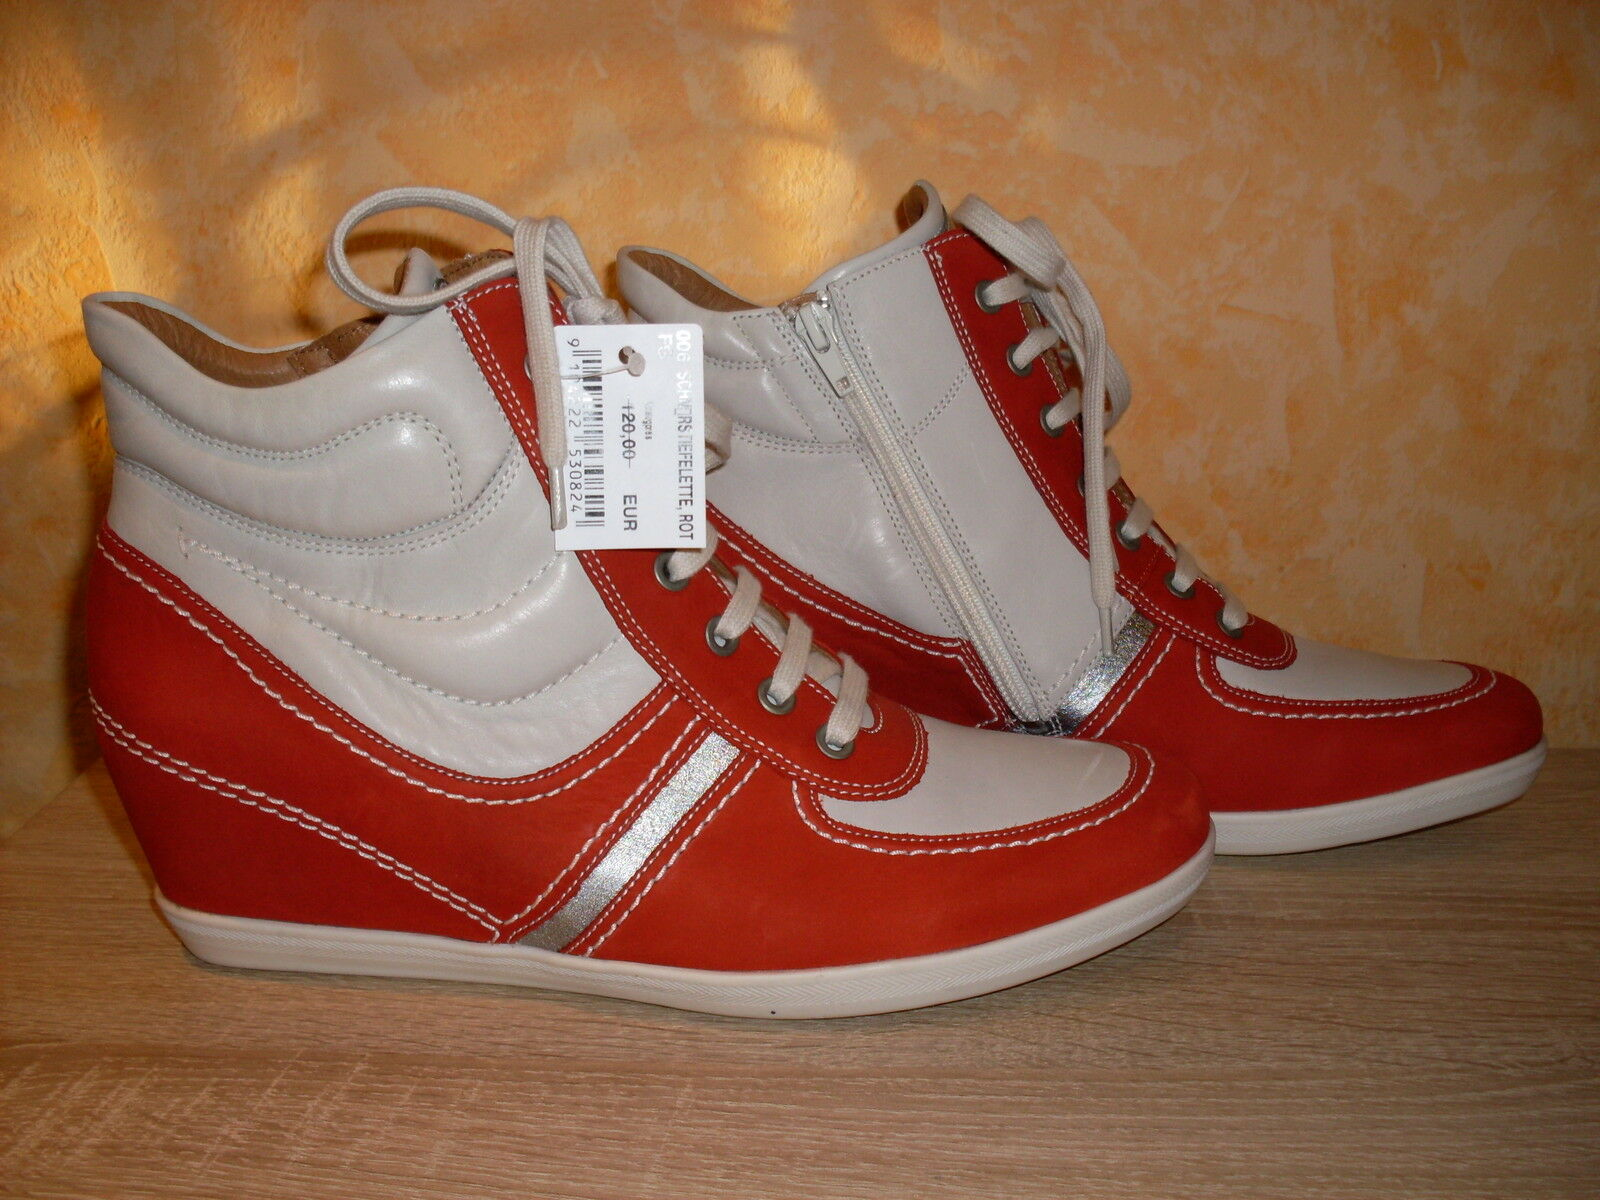 Edle Keil Ara KEIL Stiefelette / Keil Edle Sneakers NEU viele Farben & Grössen echt Leder ad6cdf